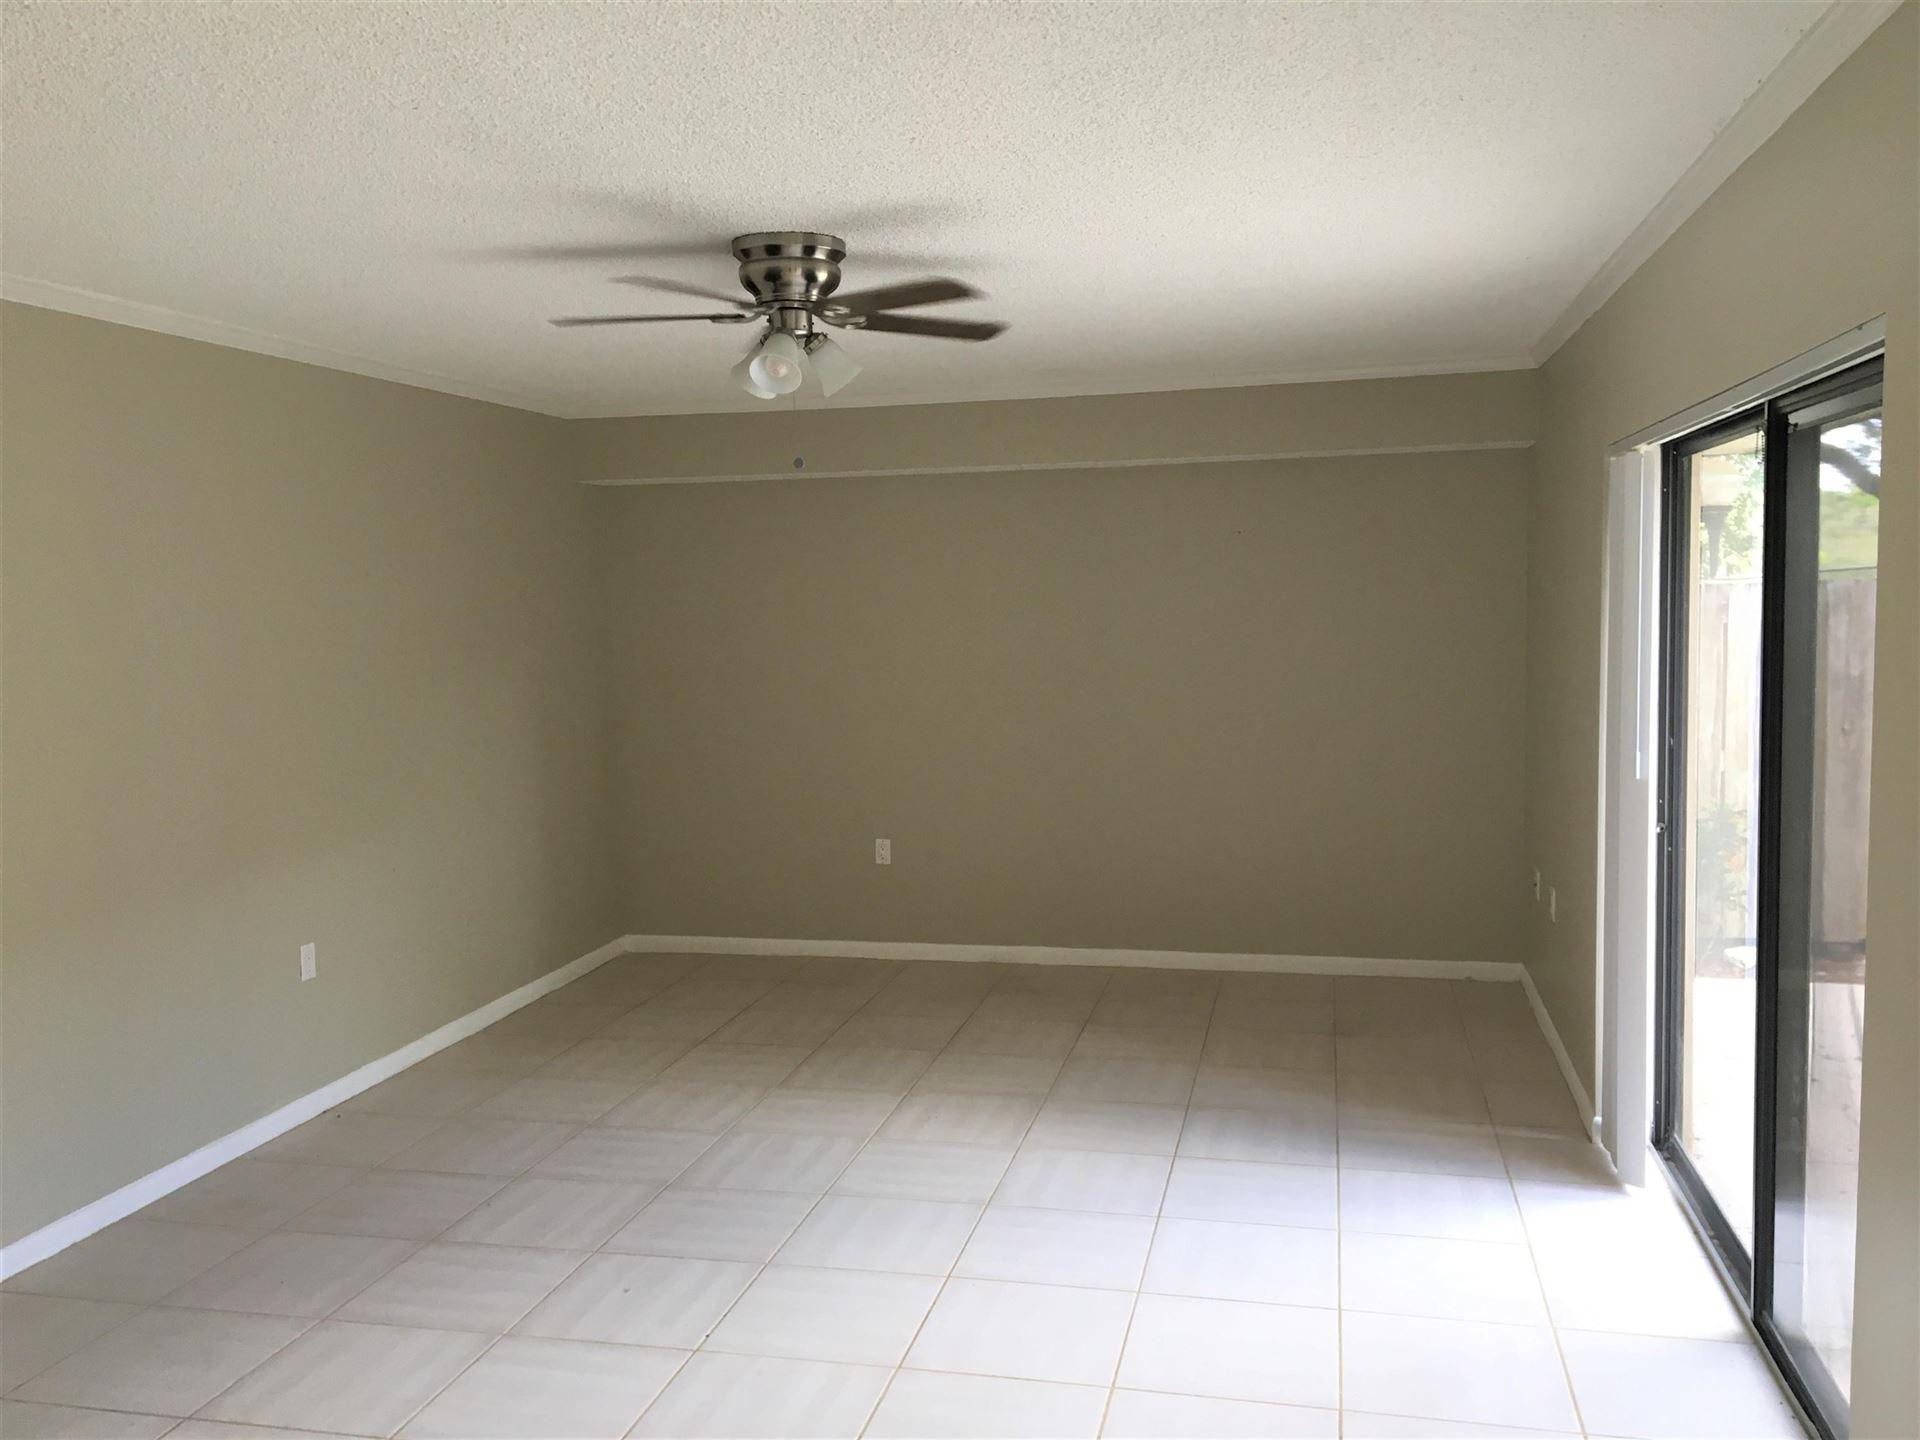 Photo of 3019 30th Court, Jupiter, FL 33477 (MLS # RX-10667116)